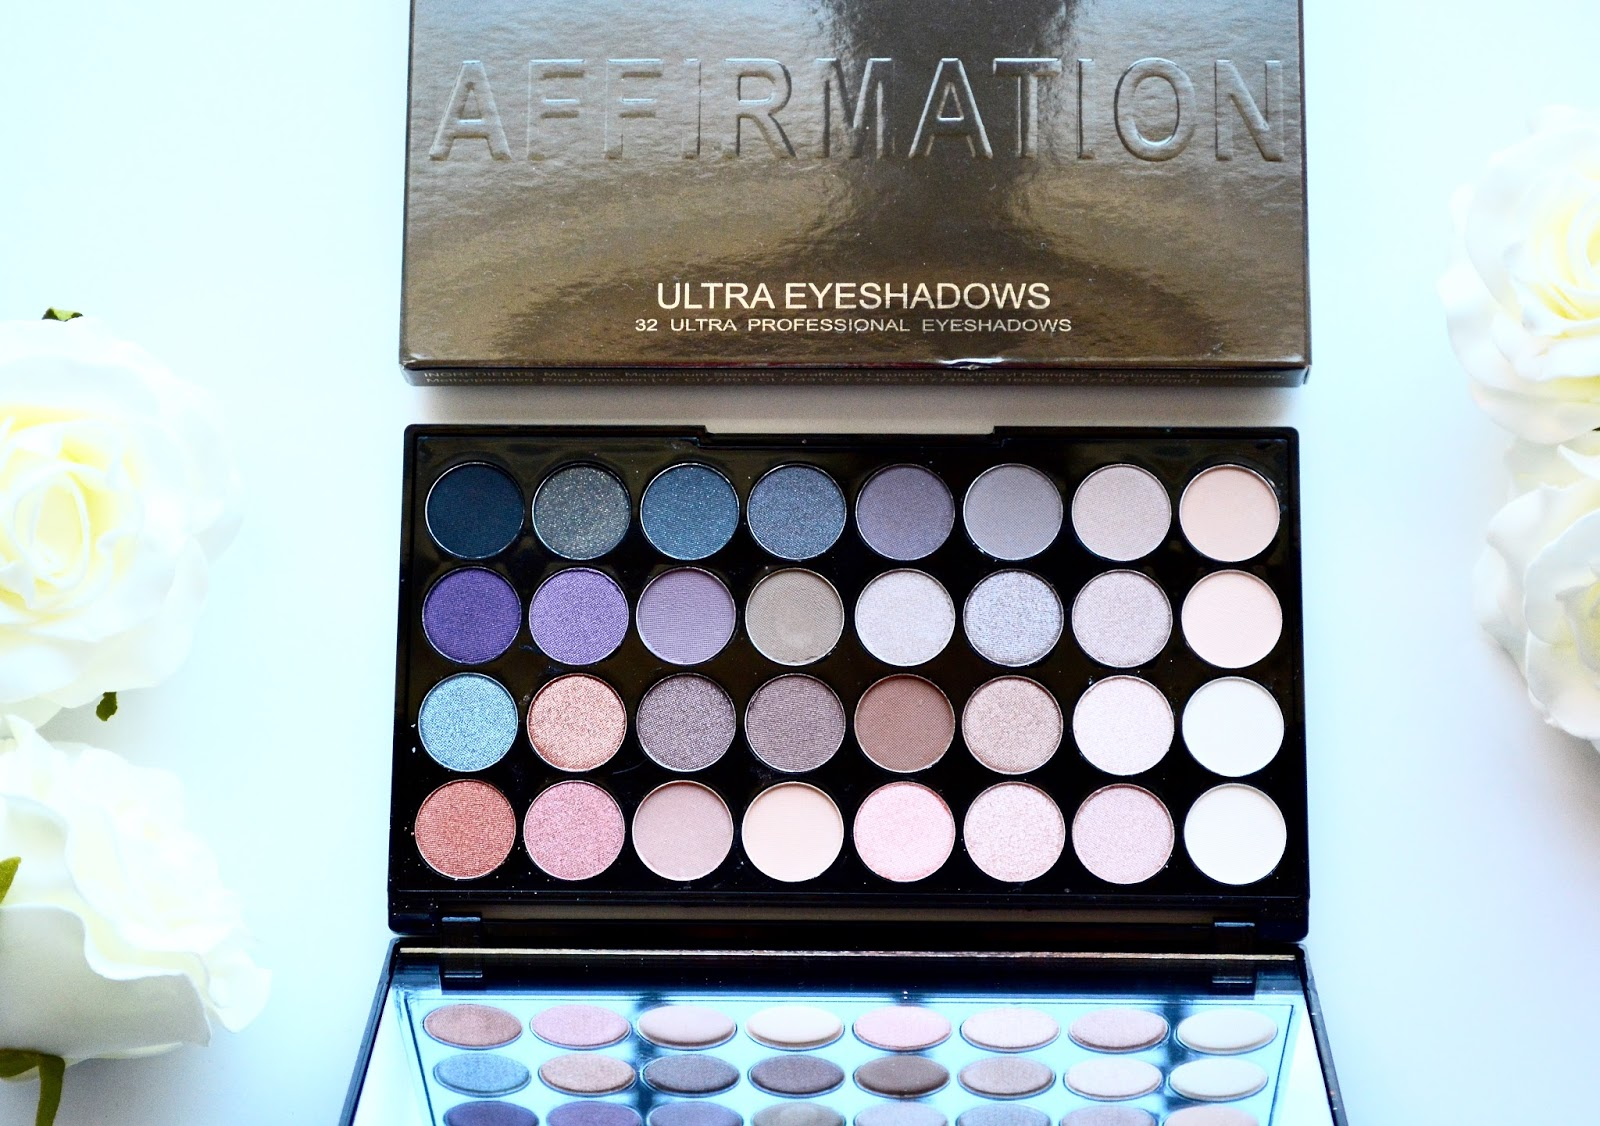 Makeup Revolution Affirmation Palette - Eyeshadow, Makeup, Everyday Palette